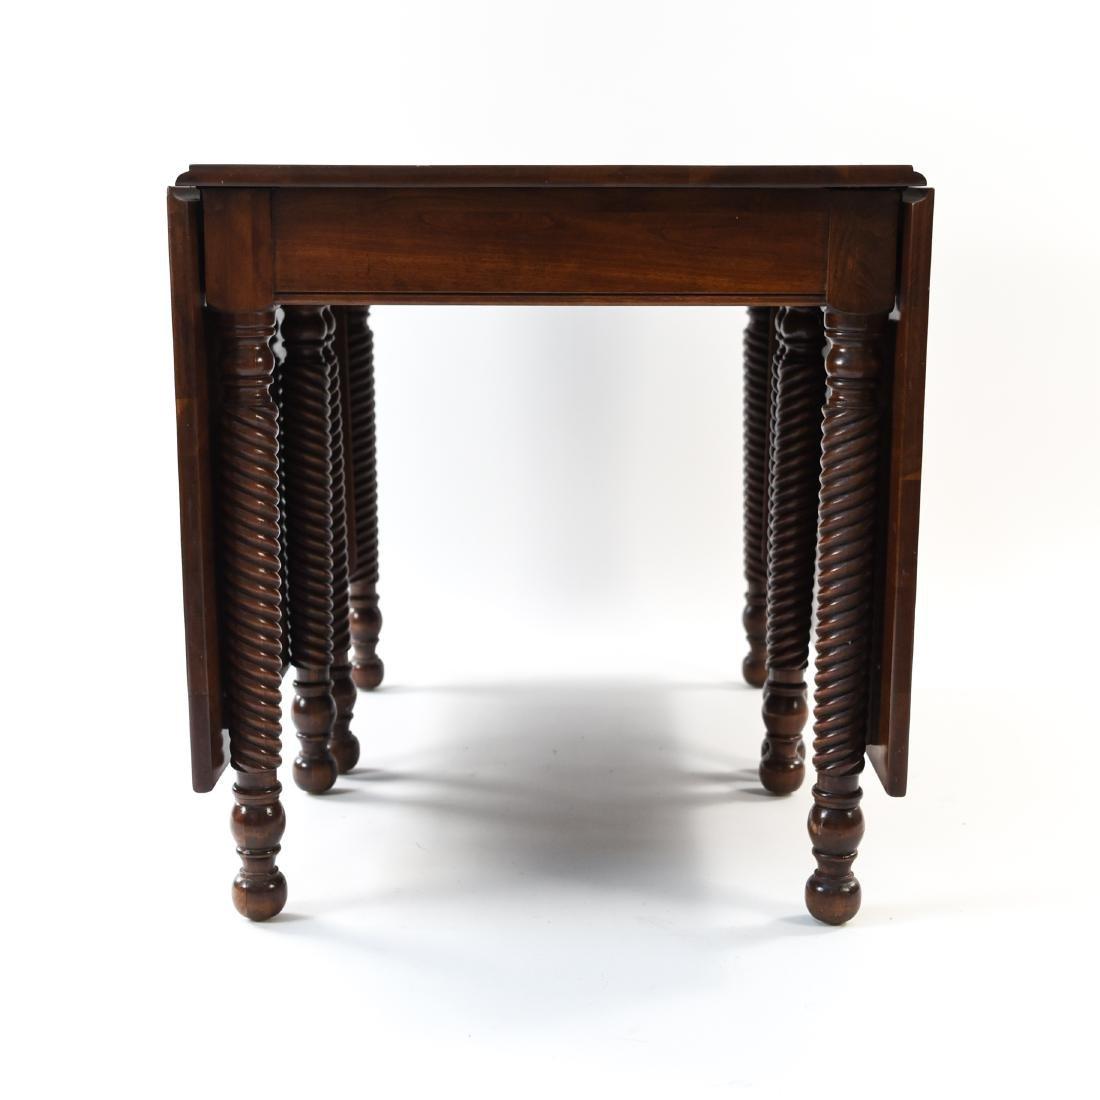 MAHOGANY DROP LEAF DINING TABLE - 4